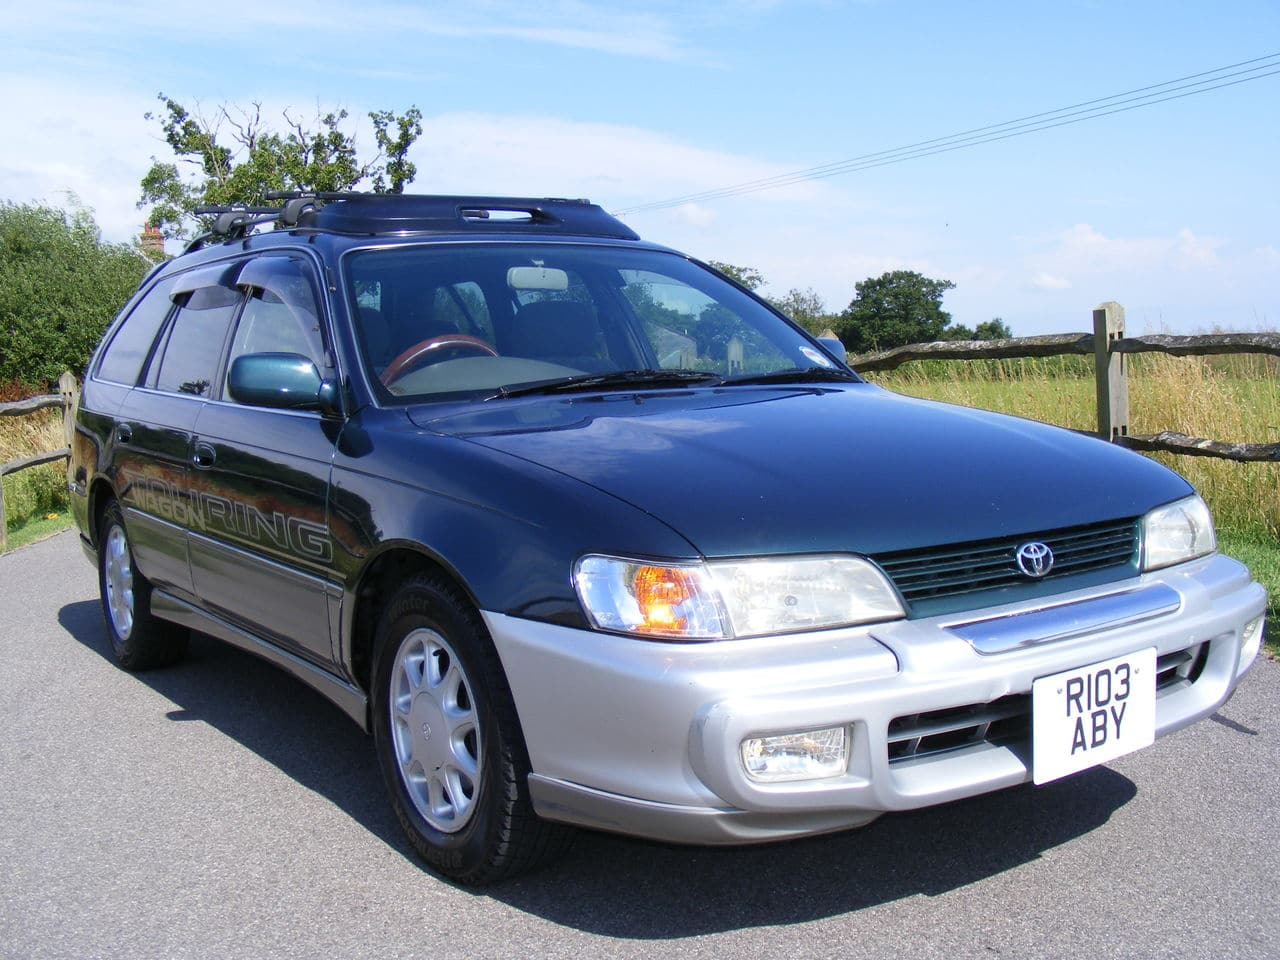 Toyota Corolla 1.6 family car Picture_2923